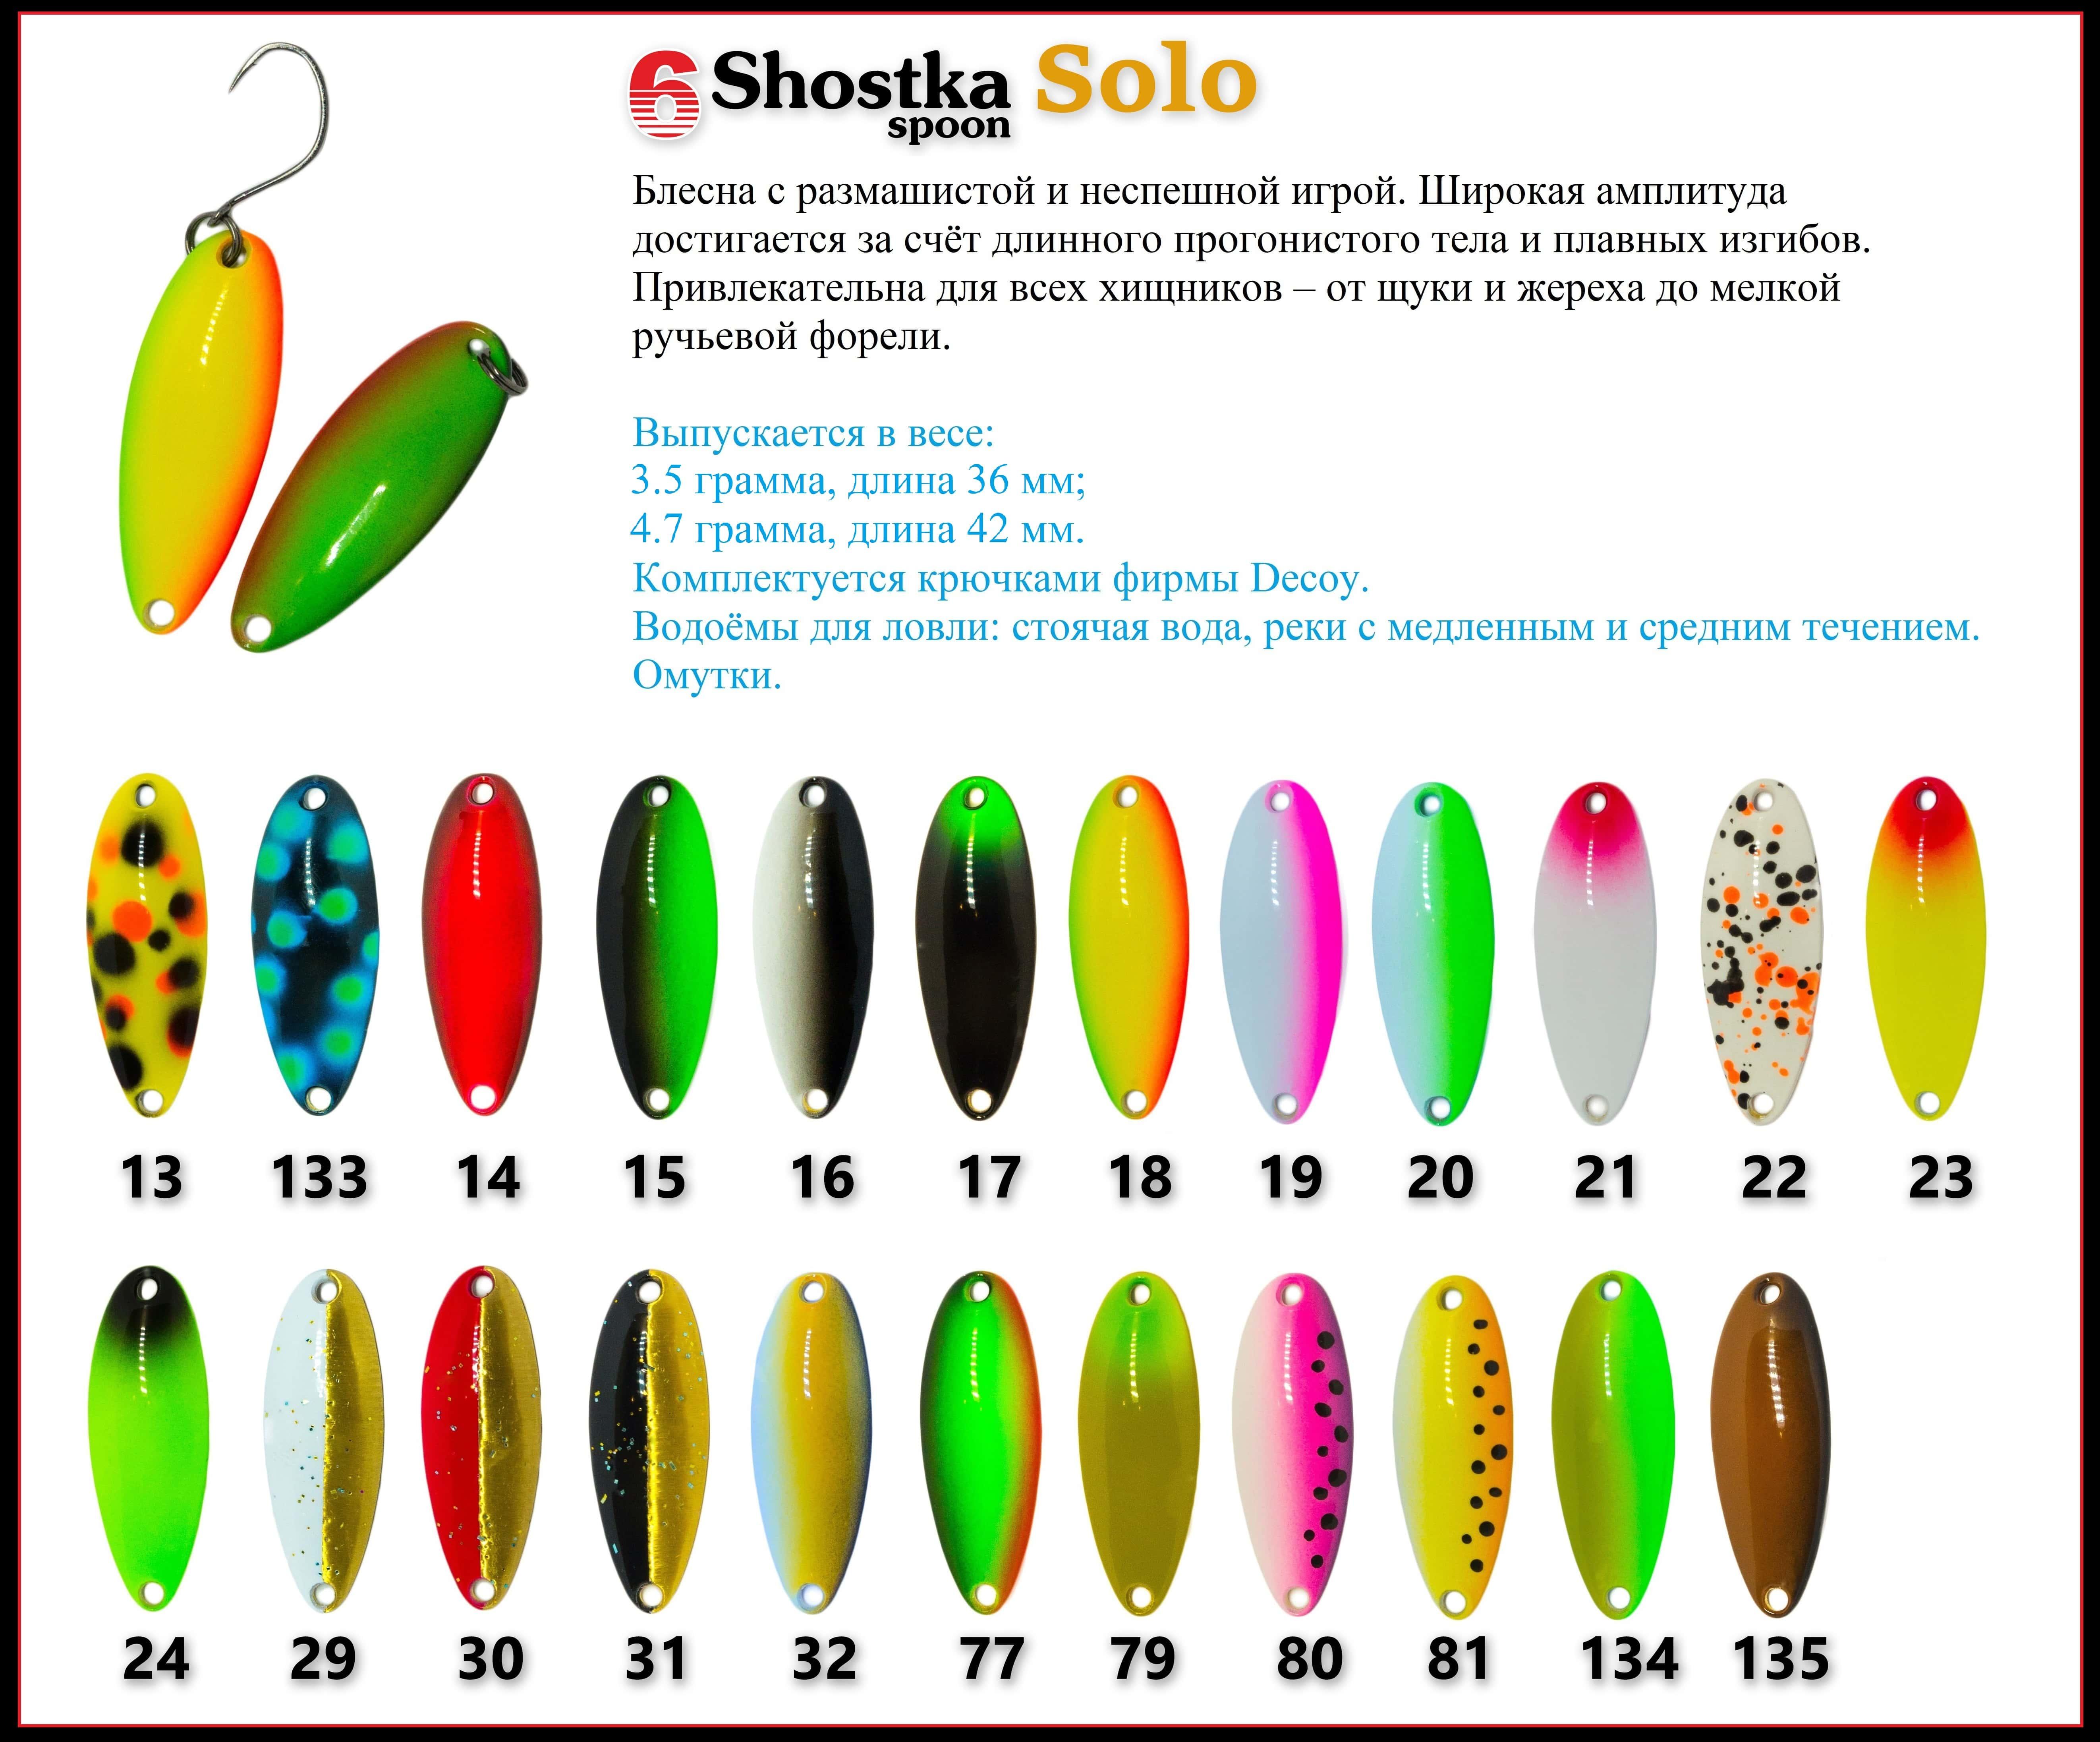 Shostka - Solo